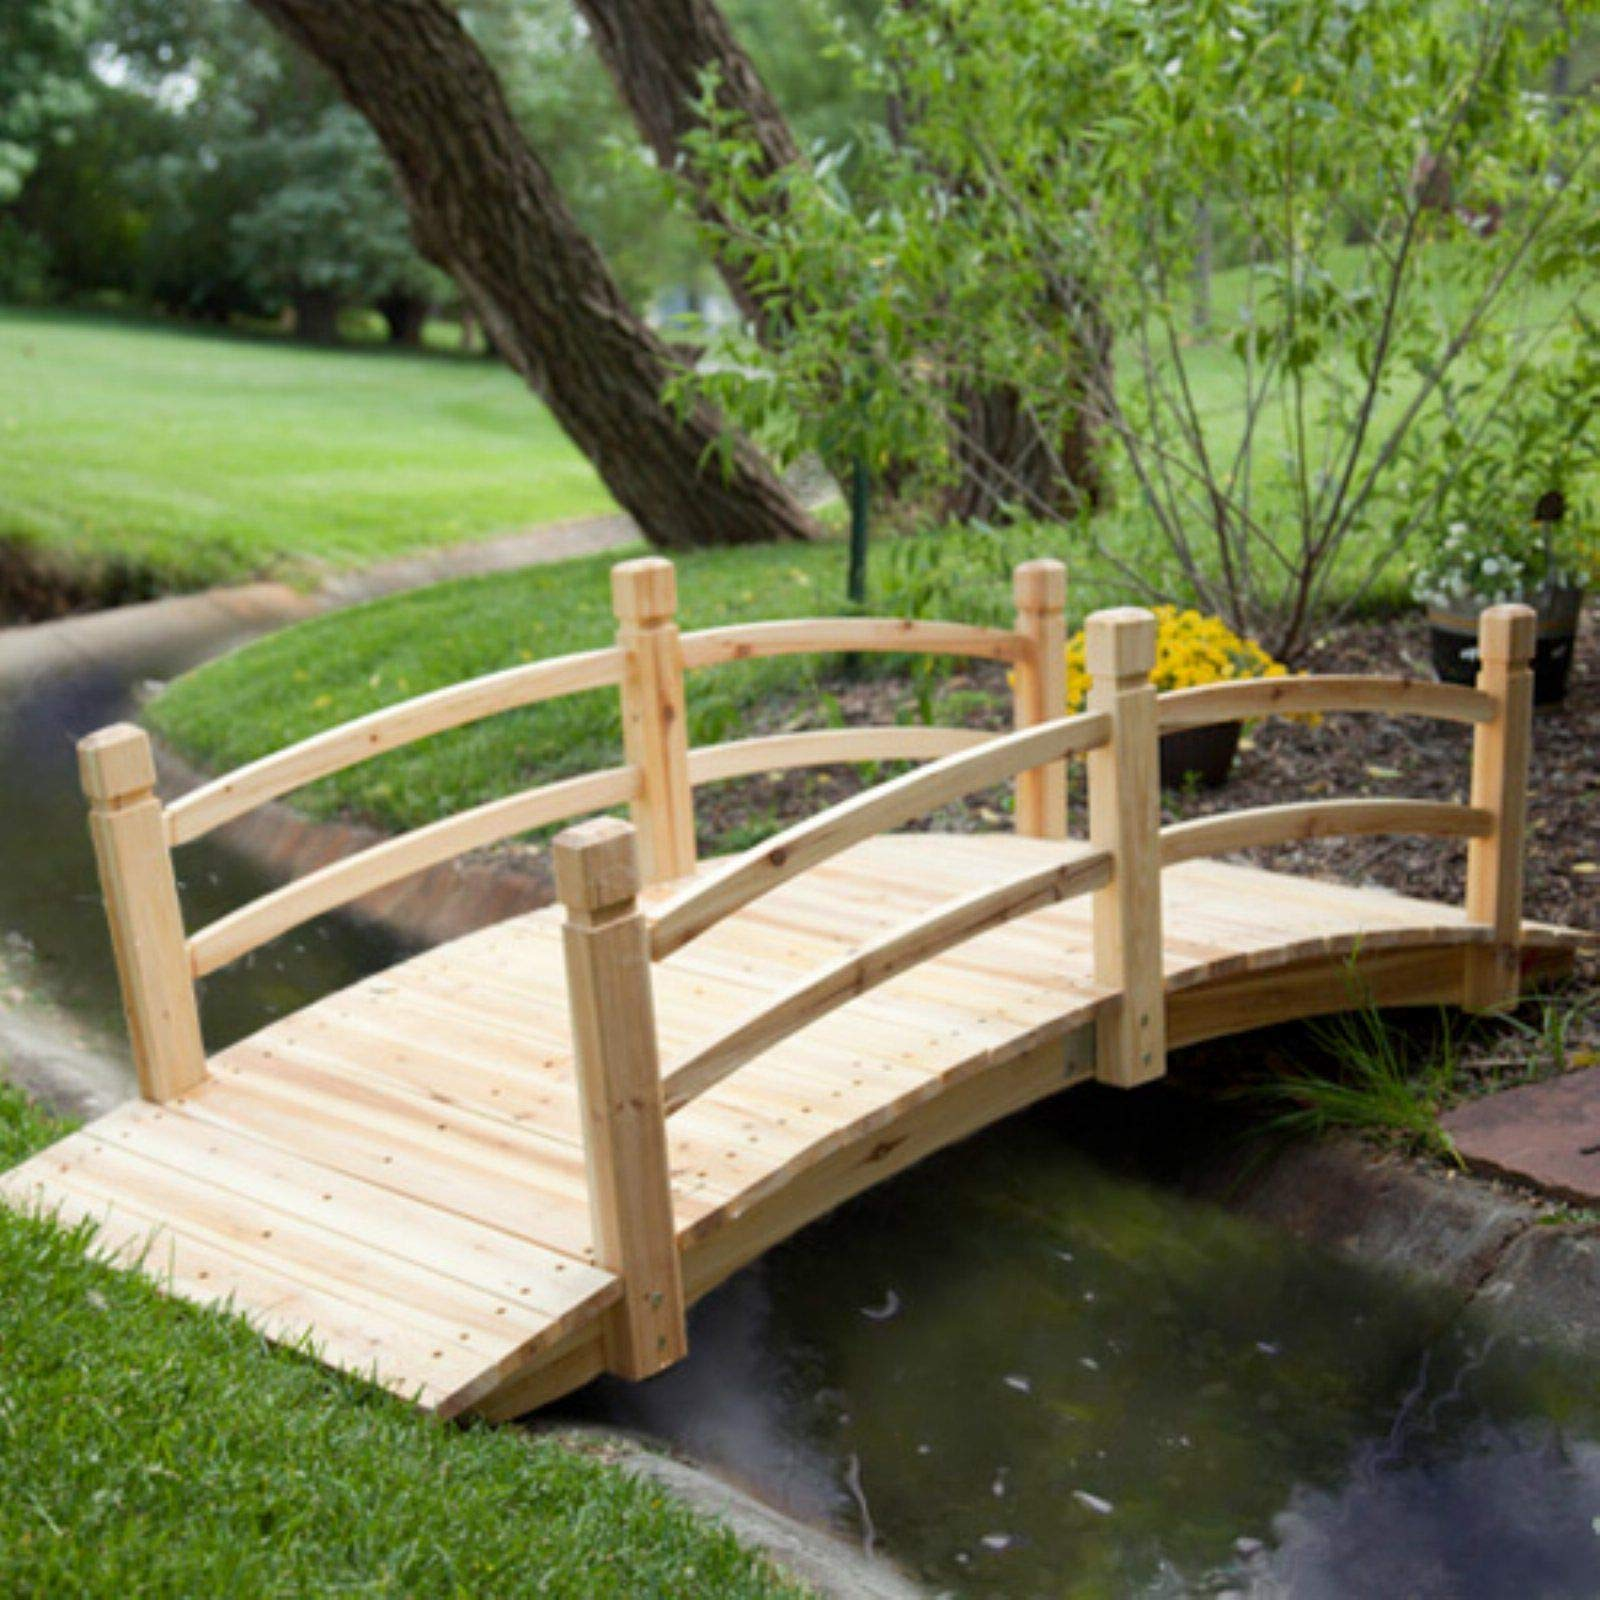 Home Improvements Natural Wood Finish 72'' Garden Bridge Outdoor Yard Lawn Landscaping Decor